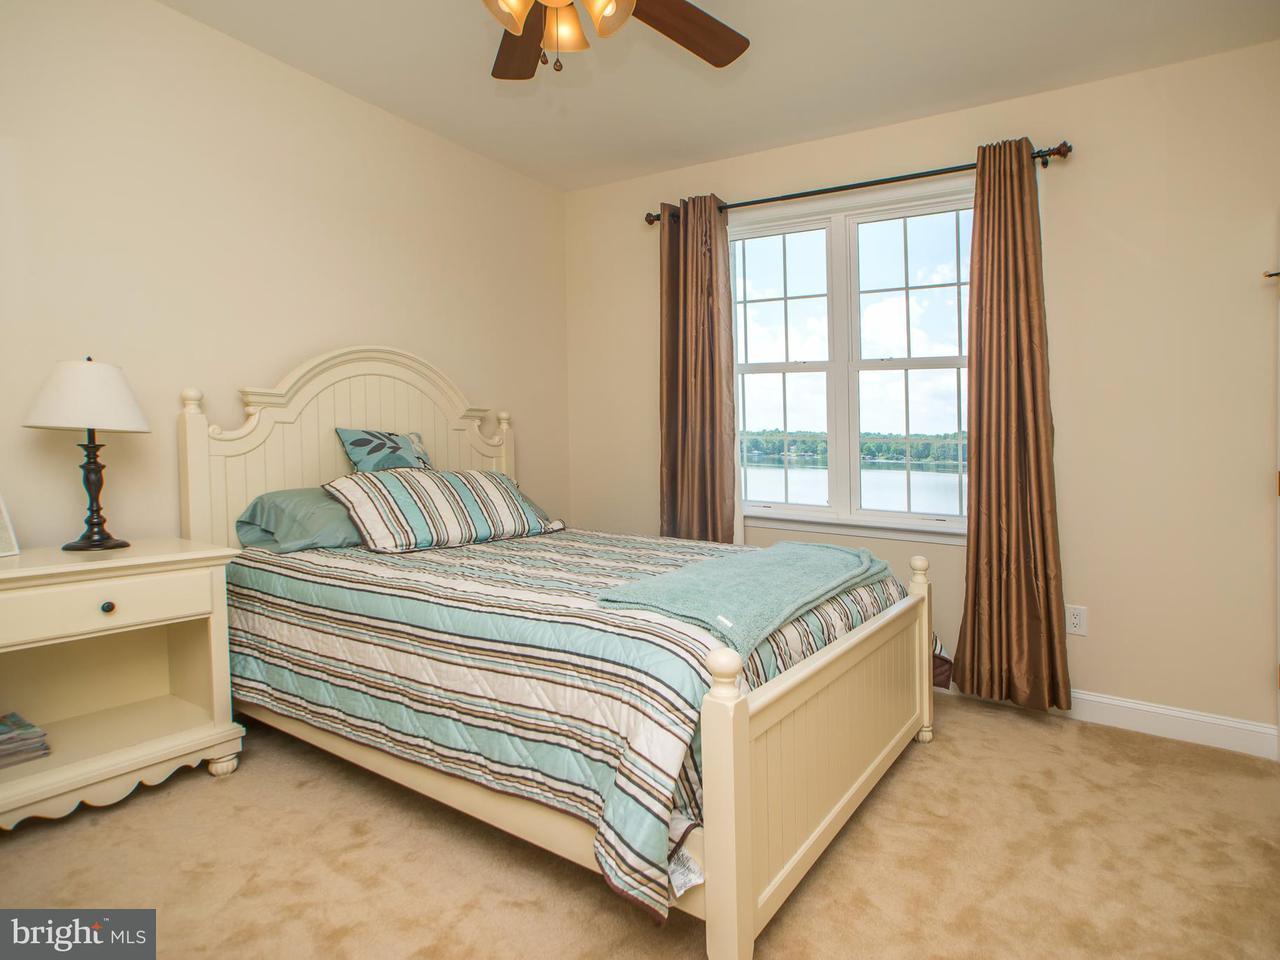 Additional photo for property listing at 259 Lane Road 259 Lane Road Bumpass, Виргиния 23024 Соединенные Штаты